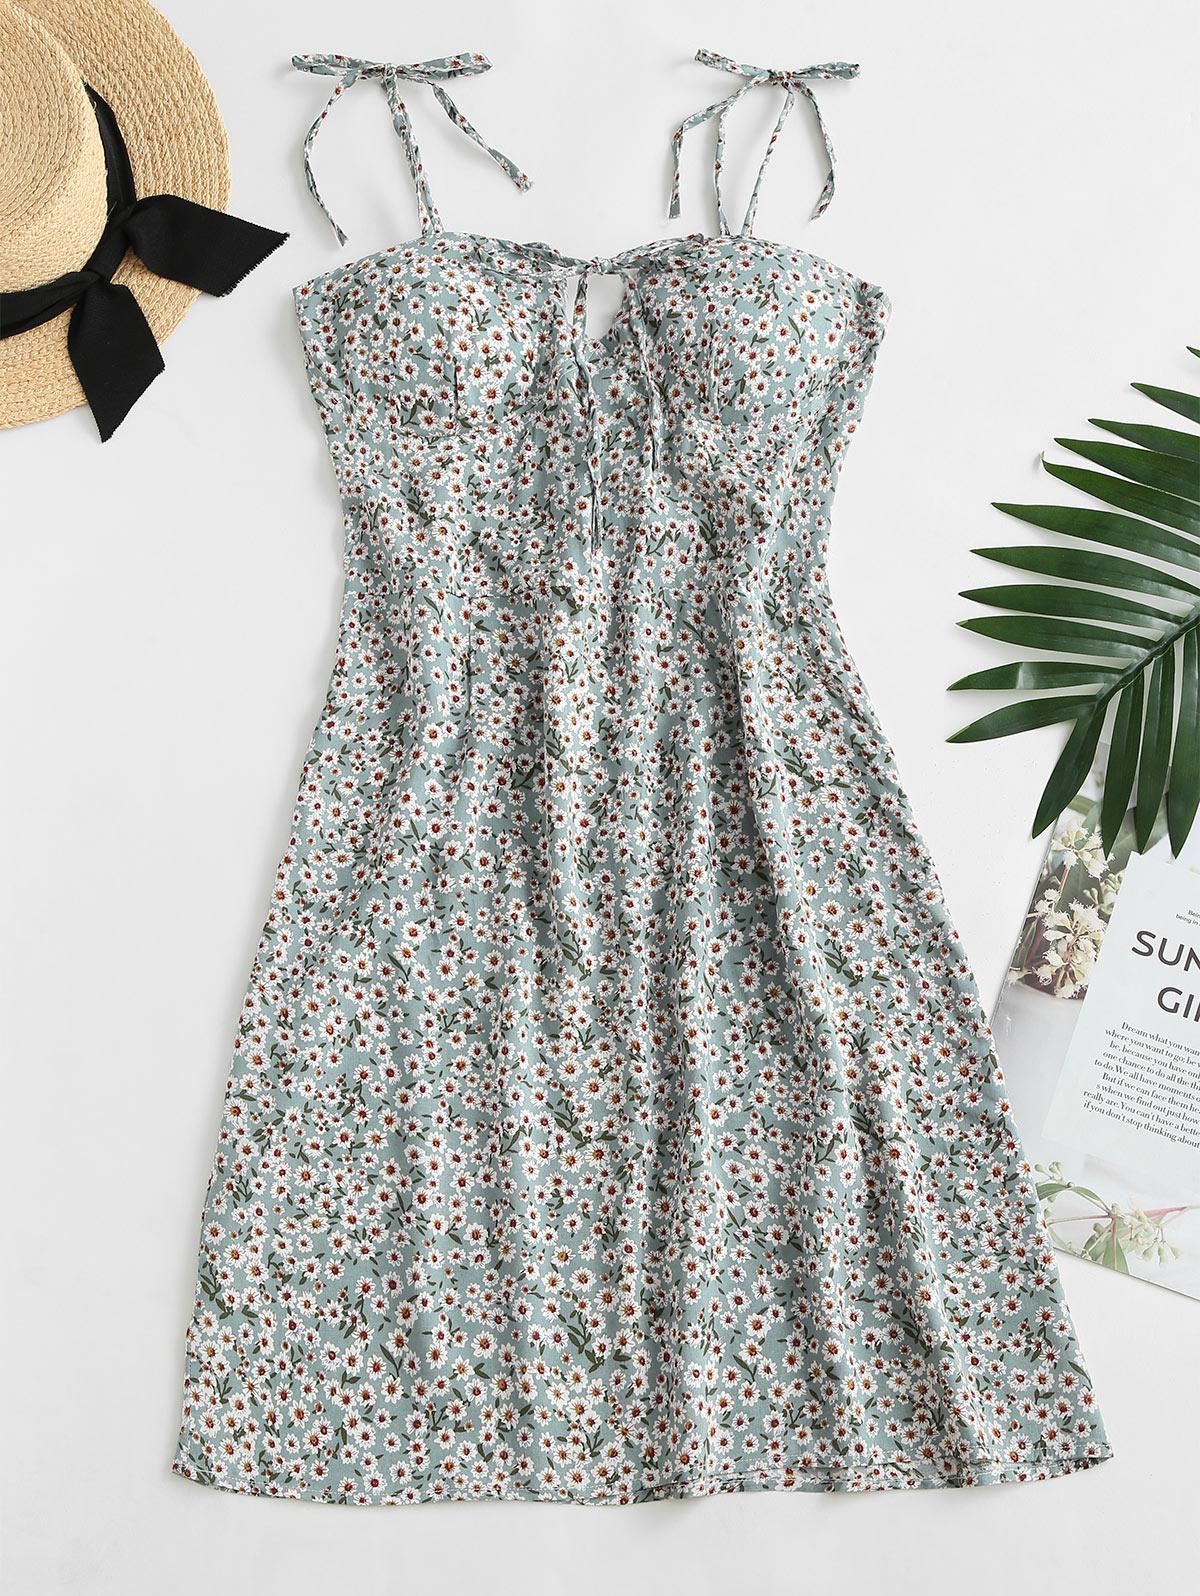 Ditsy Print Tie Shoulder Bowknot Mini Dress